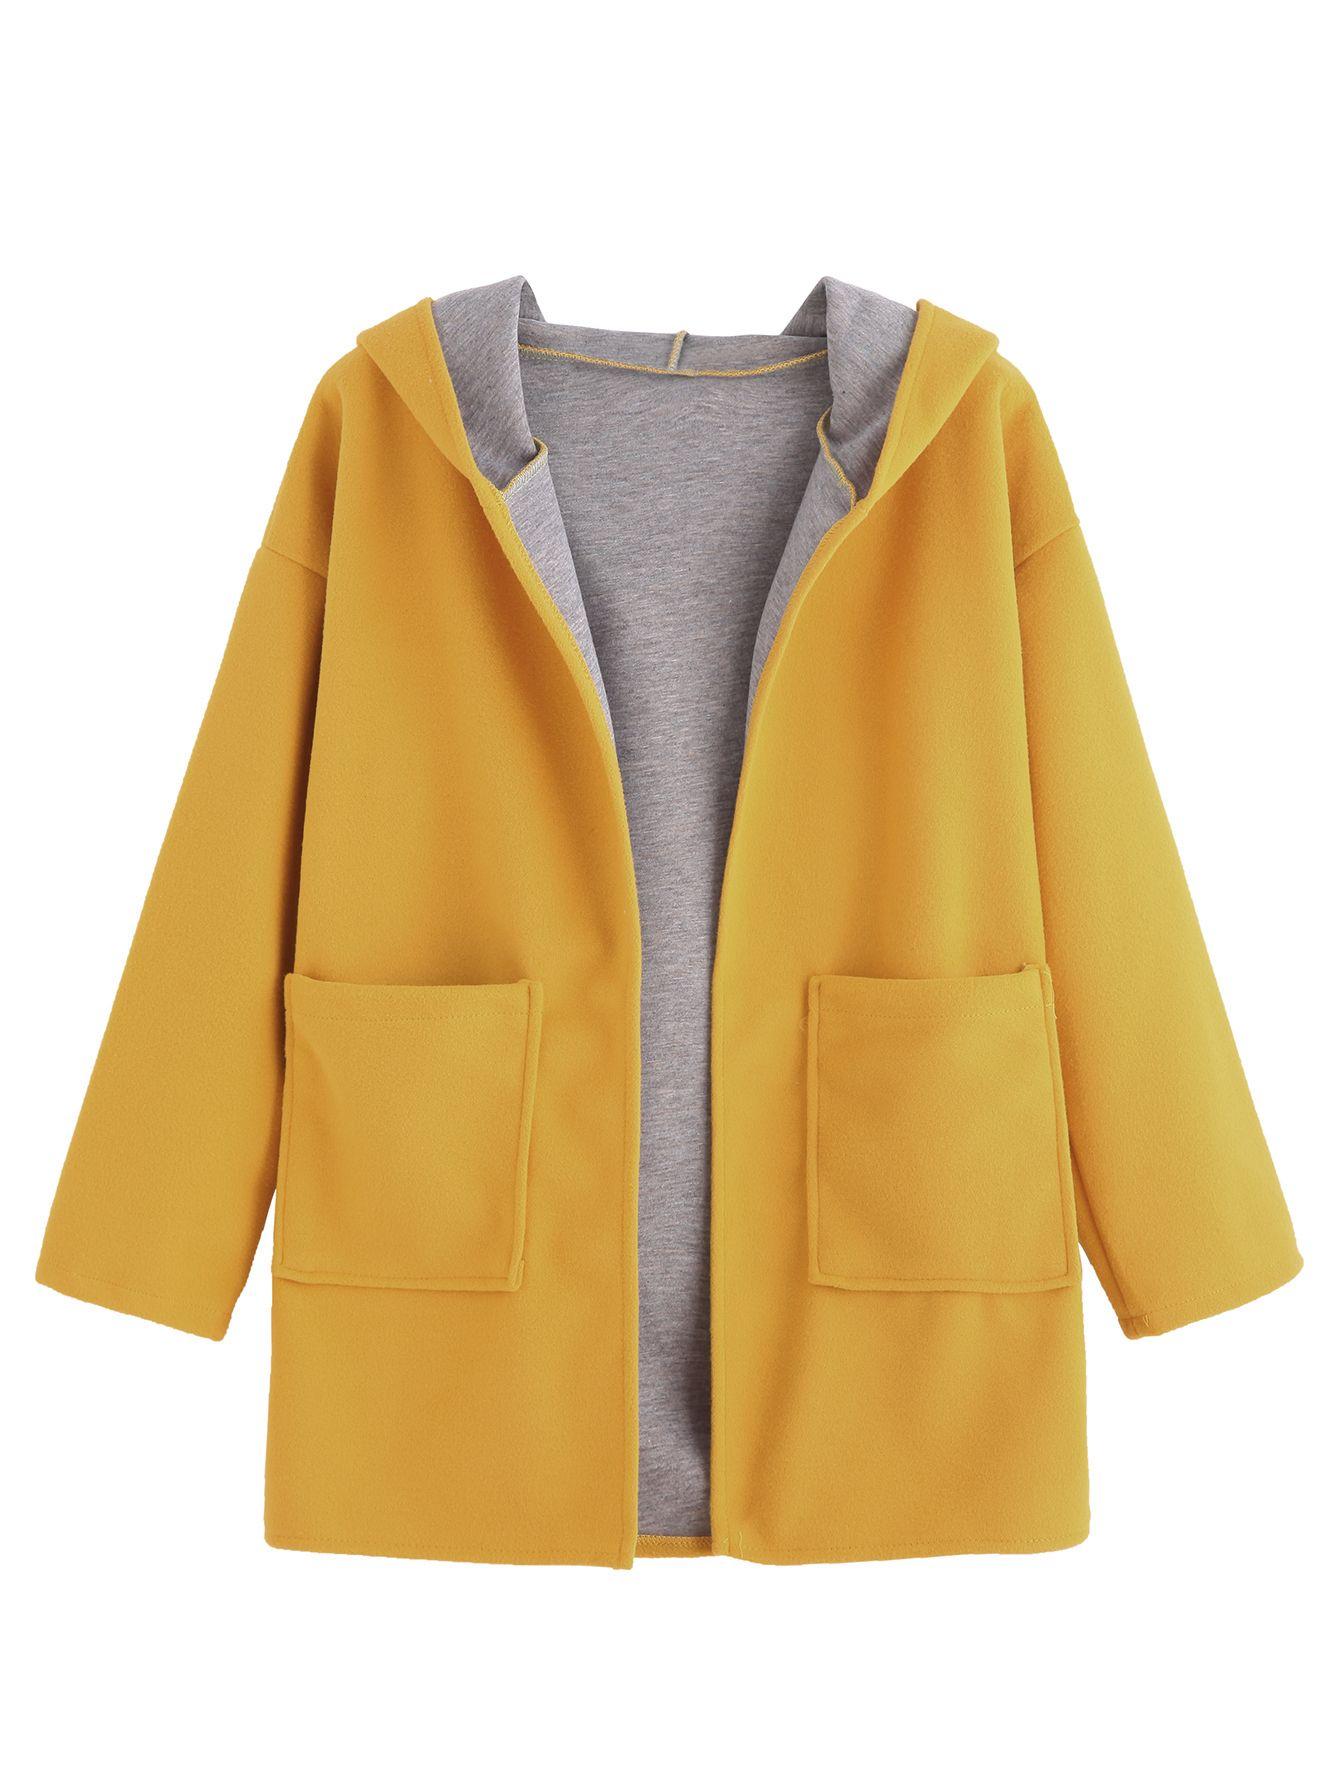 Abrigo con capucha y hombro caído - amarillo-Spanish SheIn(Sheinside) 2cae7ed79eba